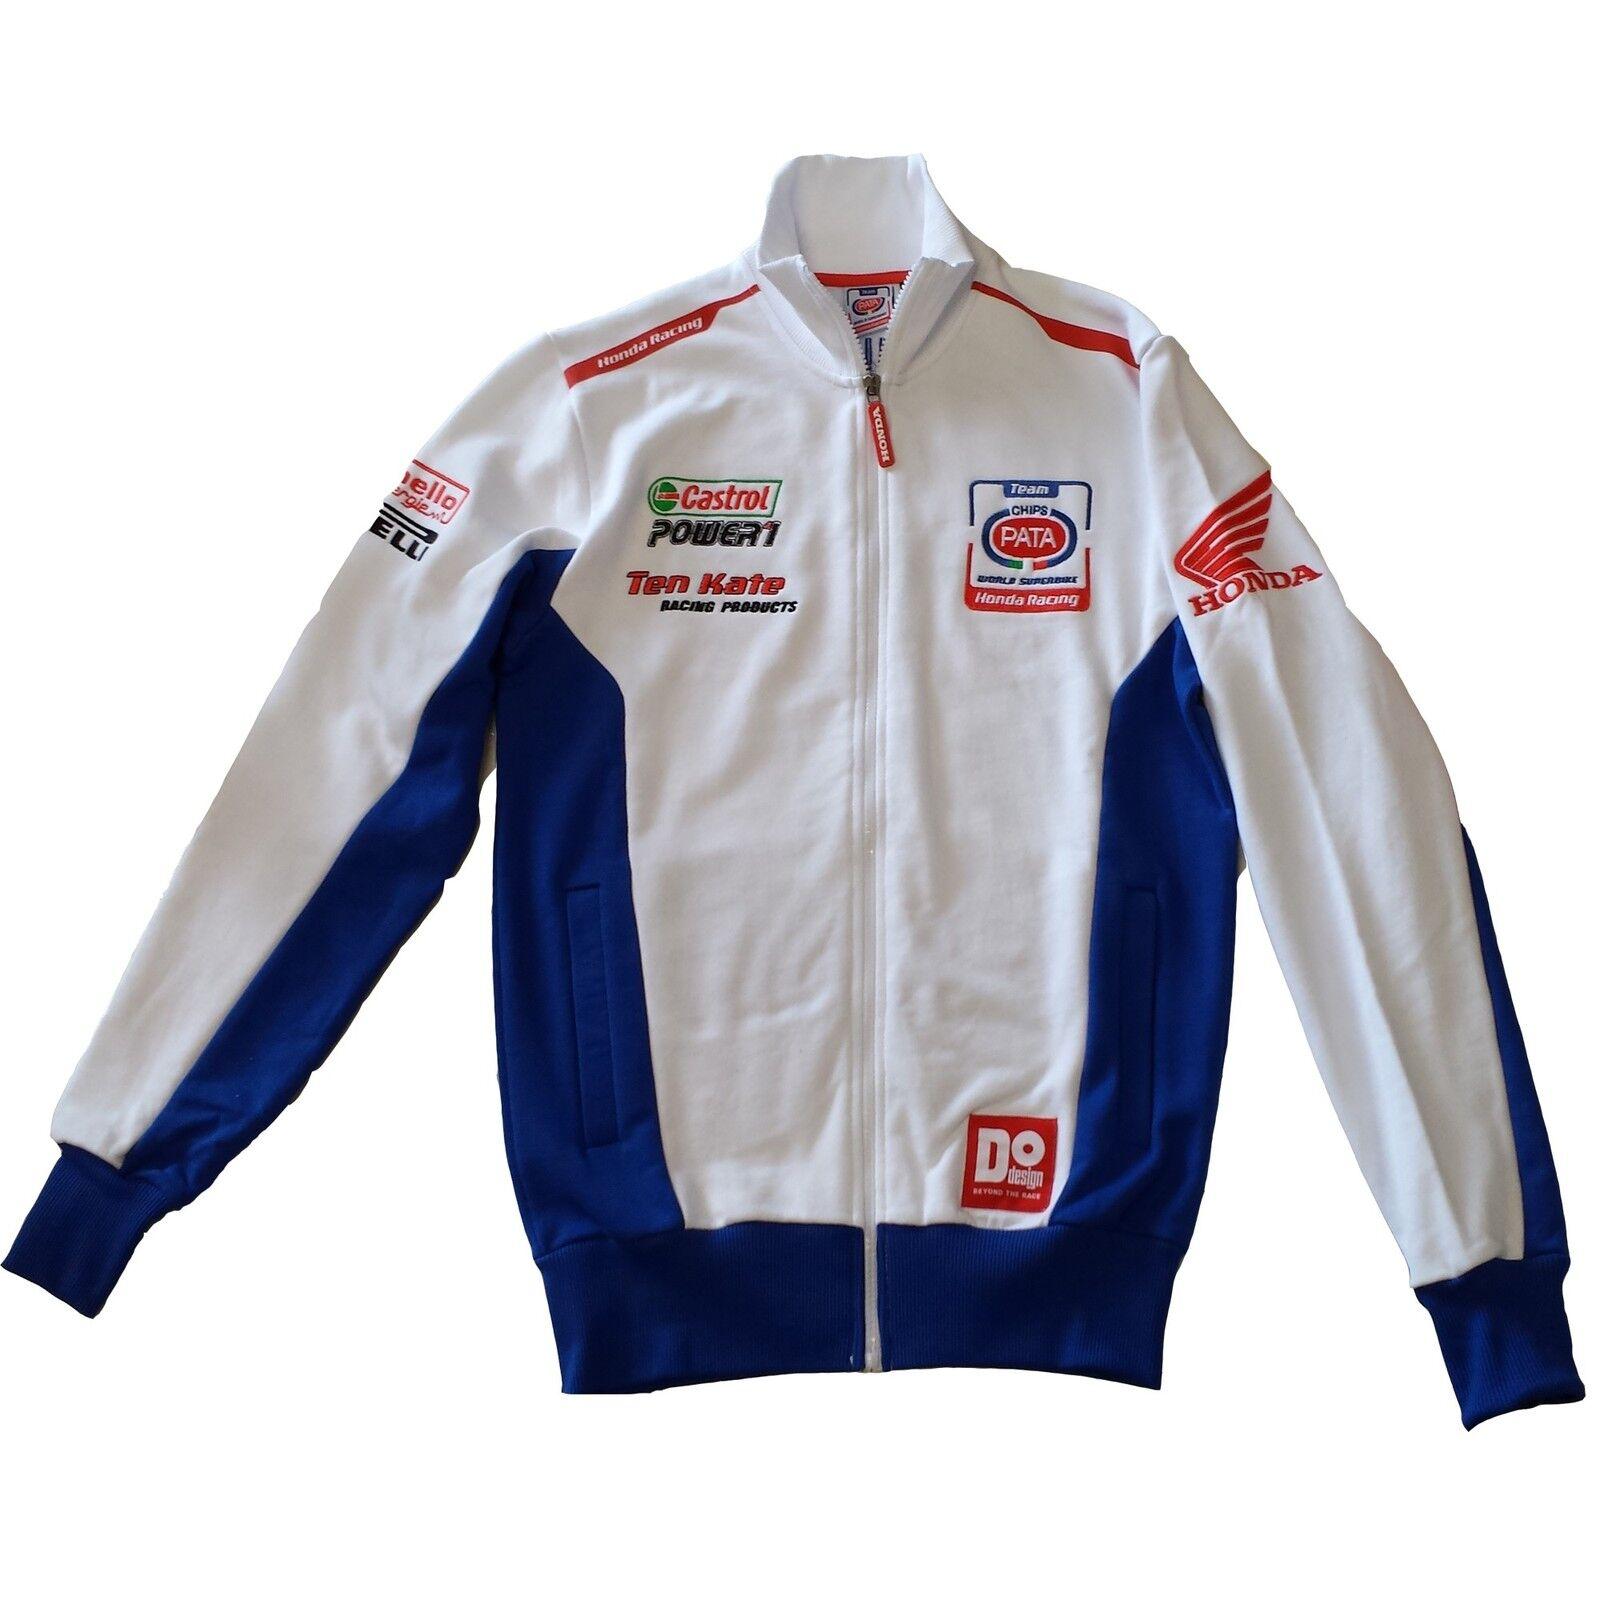 Neu Offiziell Pata Honda Team weiß Vlies mit Reißverschluss